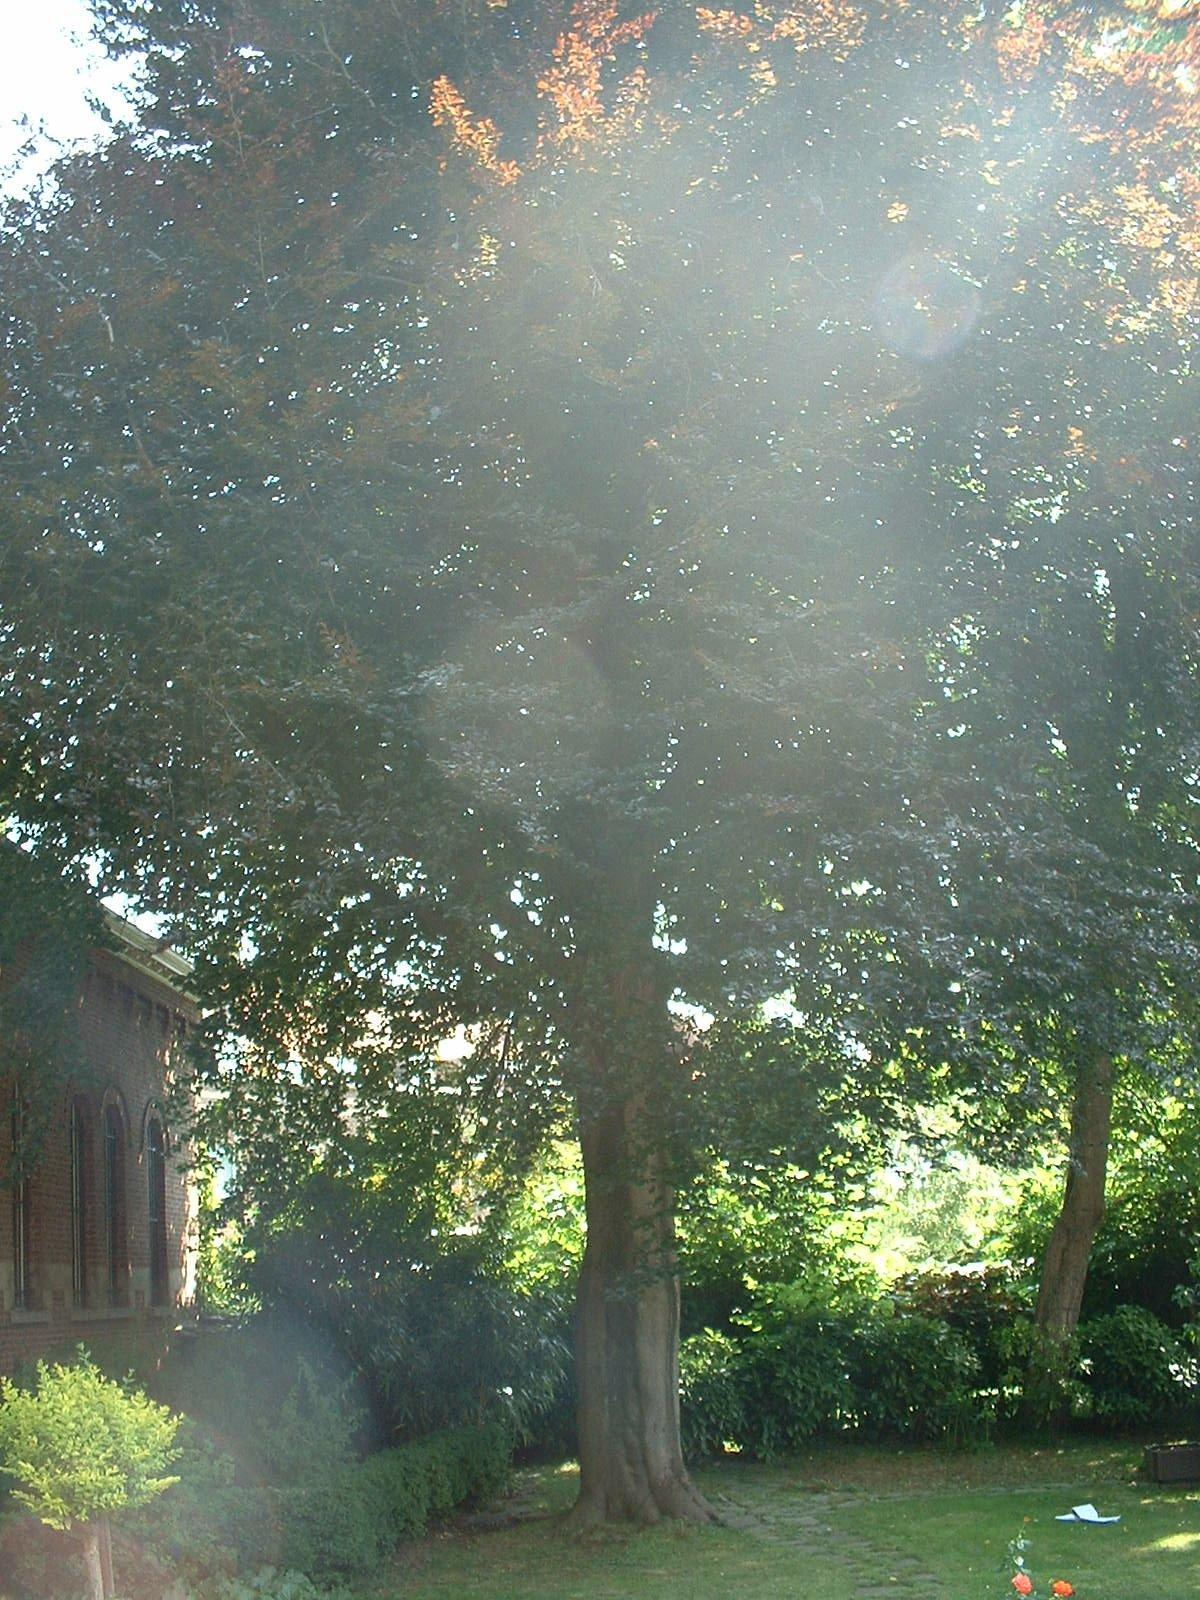 Hêtre pourpre – Ixelles, Rue Joseph Stallaert, 8 –  17 Juin 2003